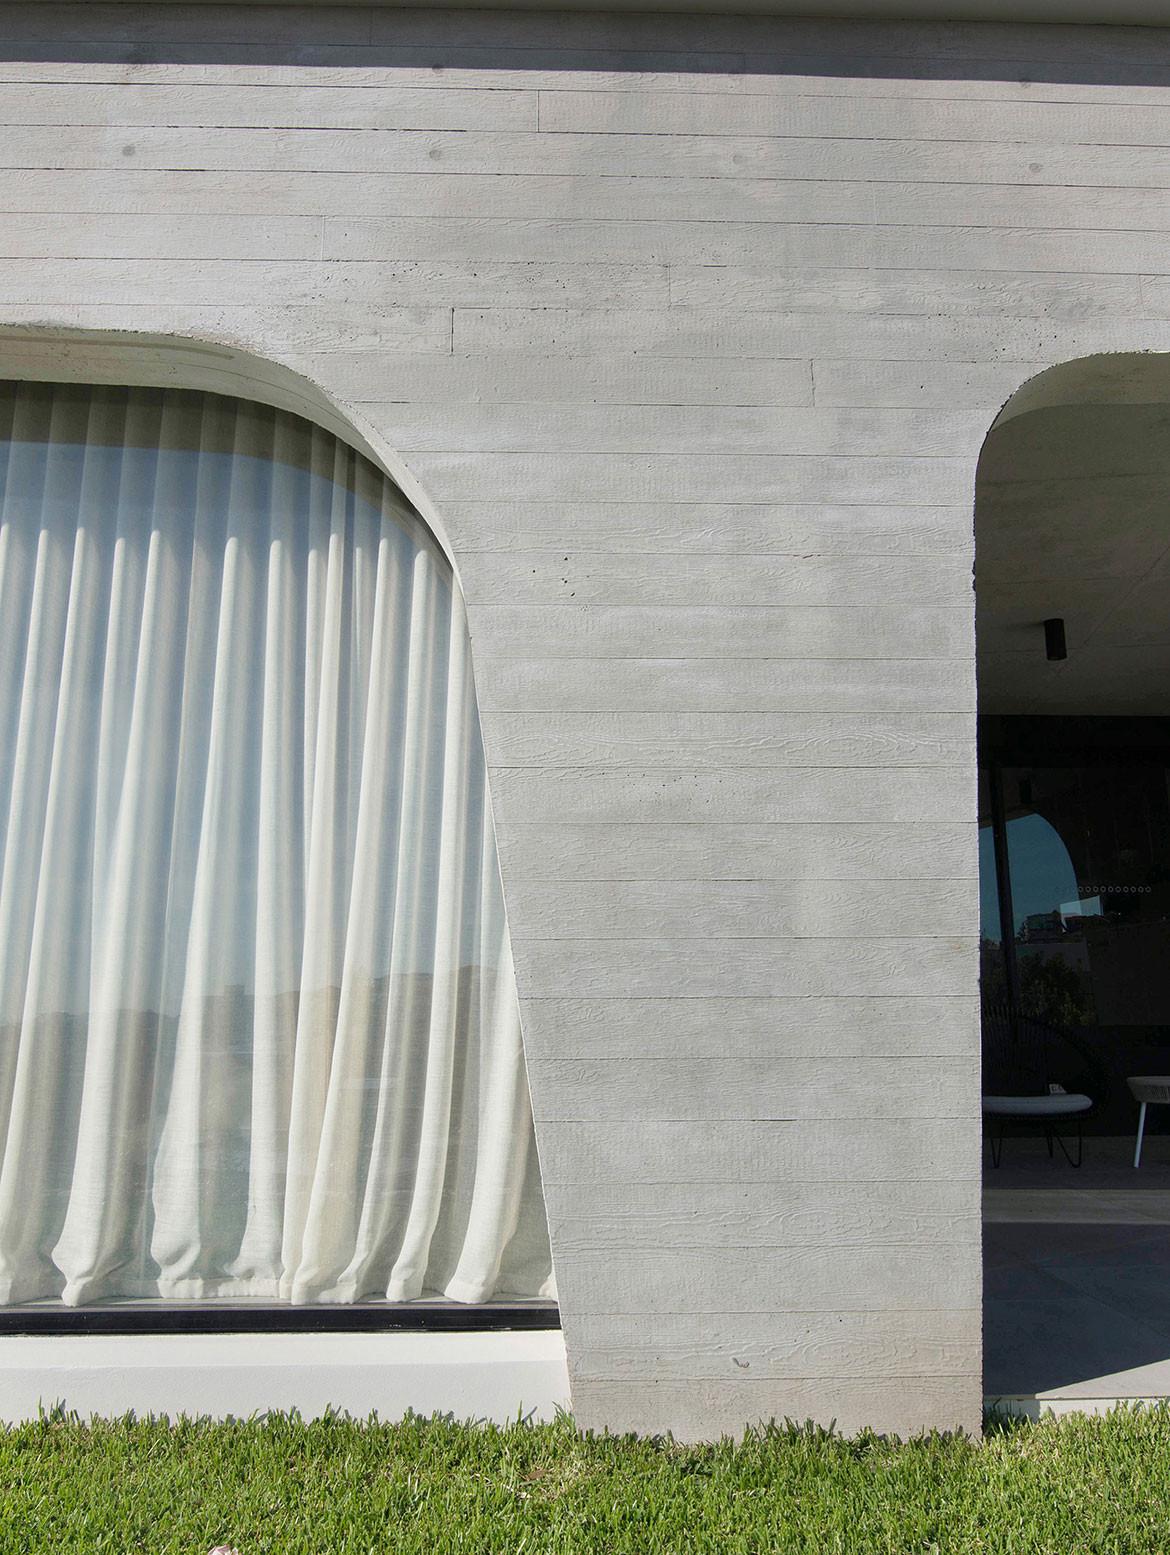 Tamas Tee House Luigi Rosselli Architects exterior detailing